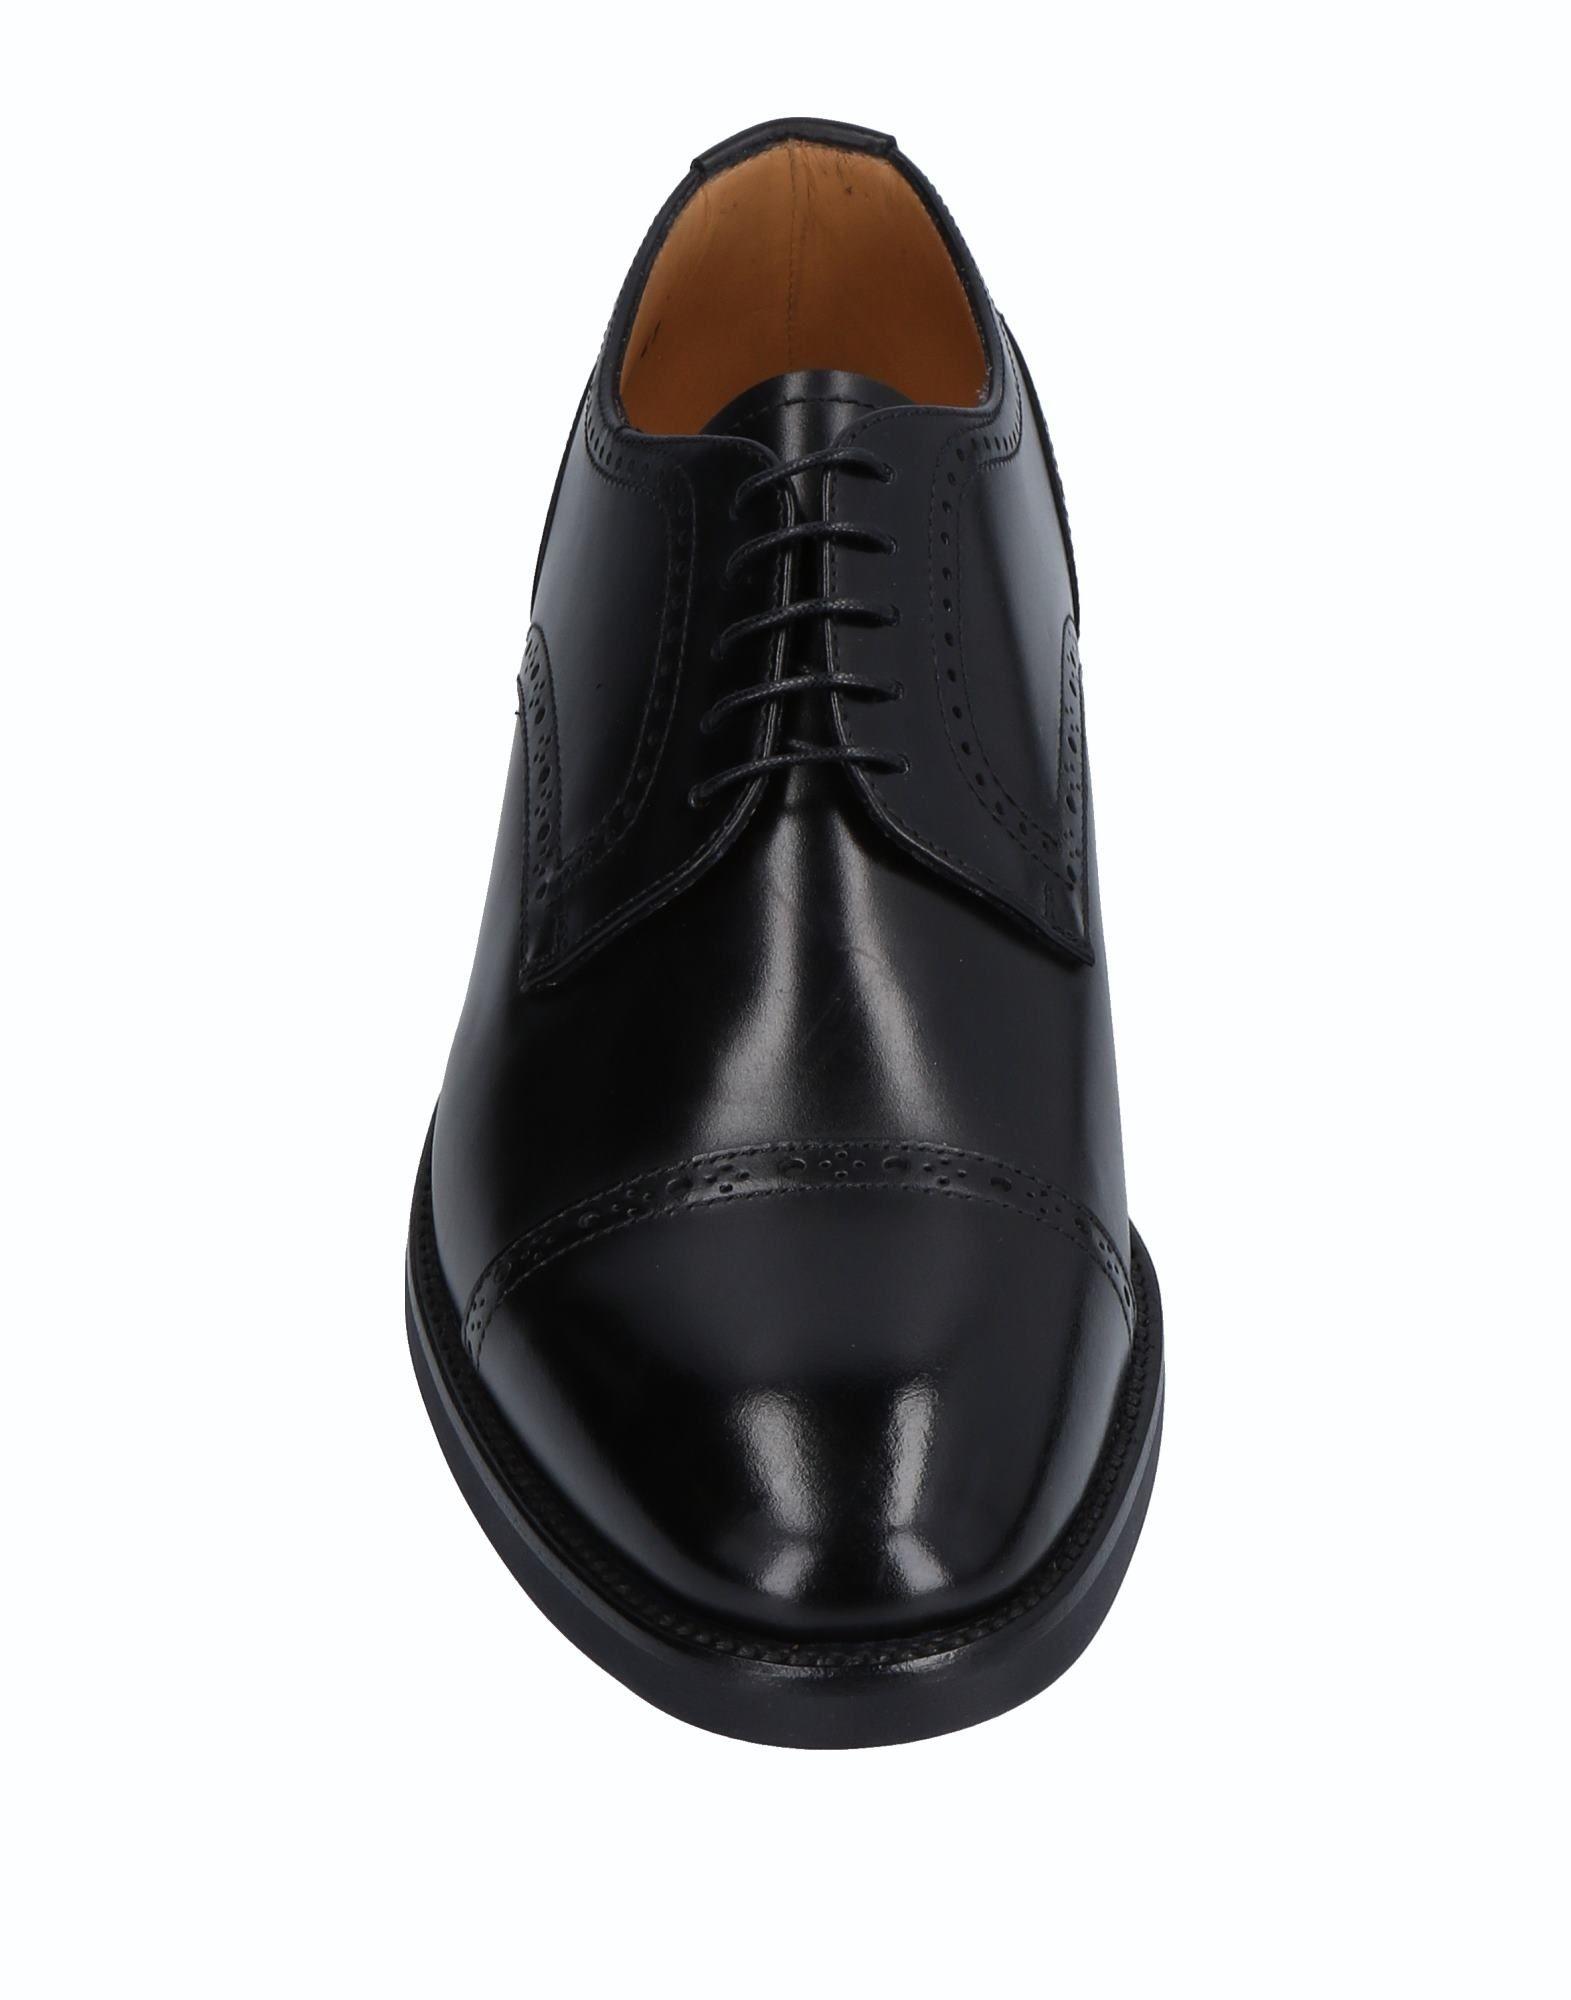 Fabi Schnürschuhe Herren  11517568QP Gute Qualität beliebte Schuhe